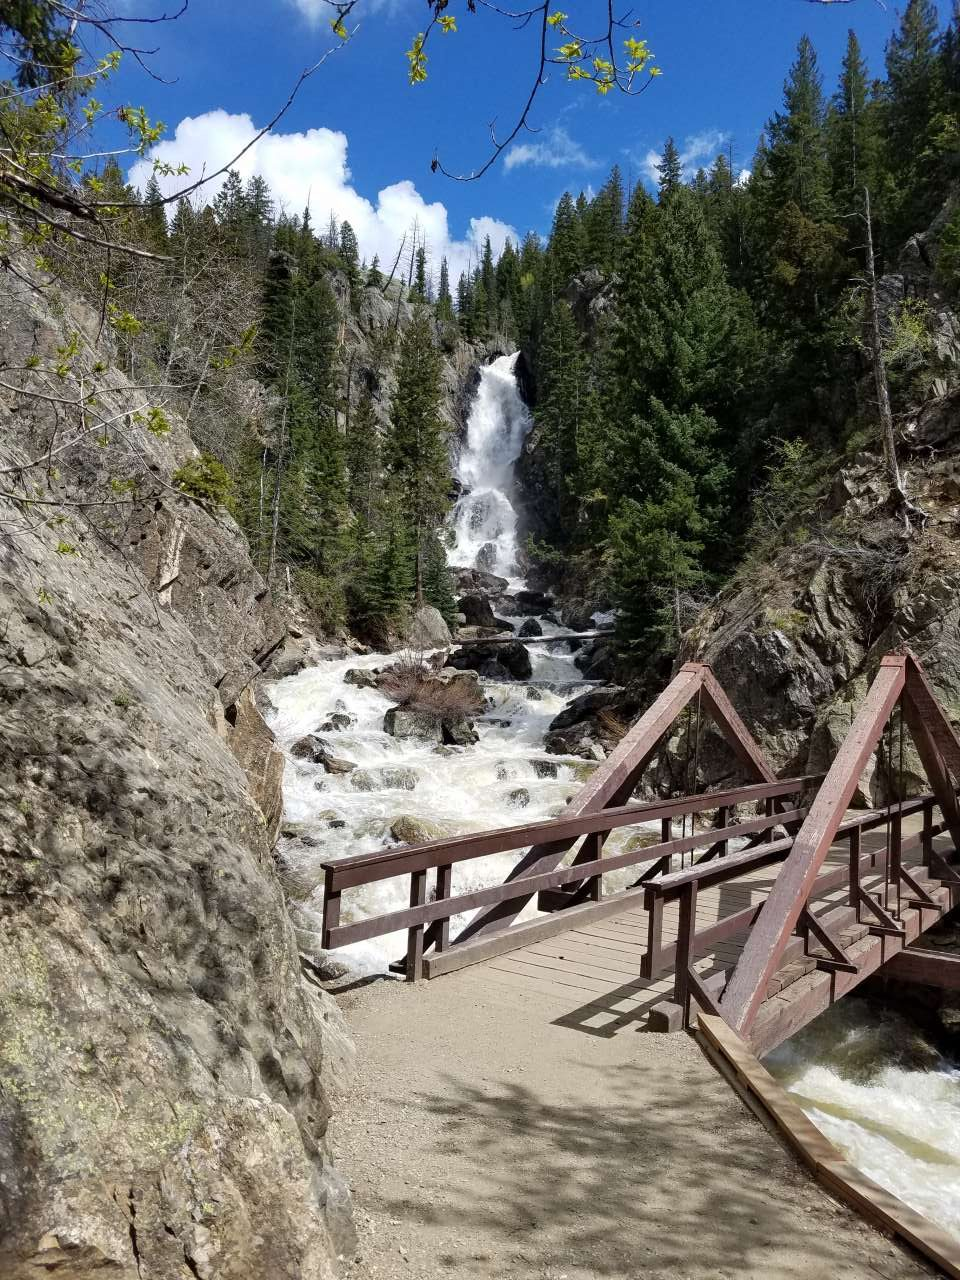 Guided bird walk 2 fish creek falls saturday 7 30 9 for Fish creek falls